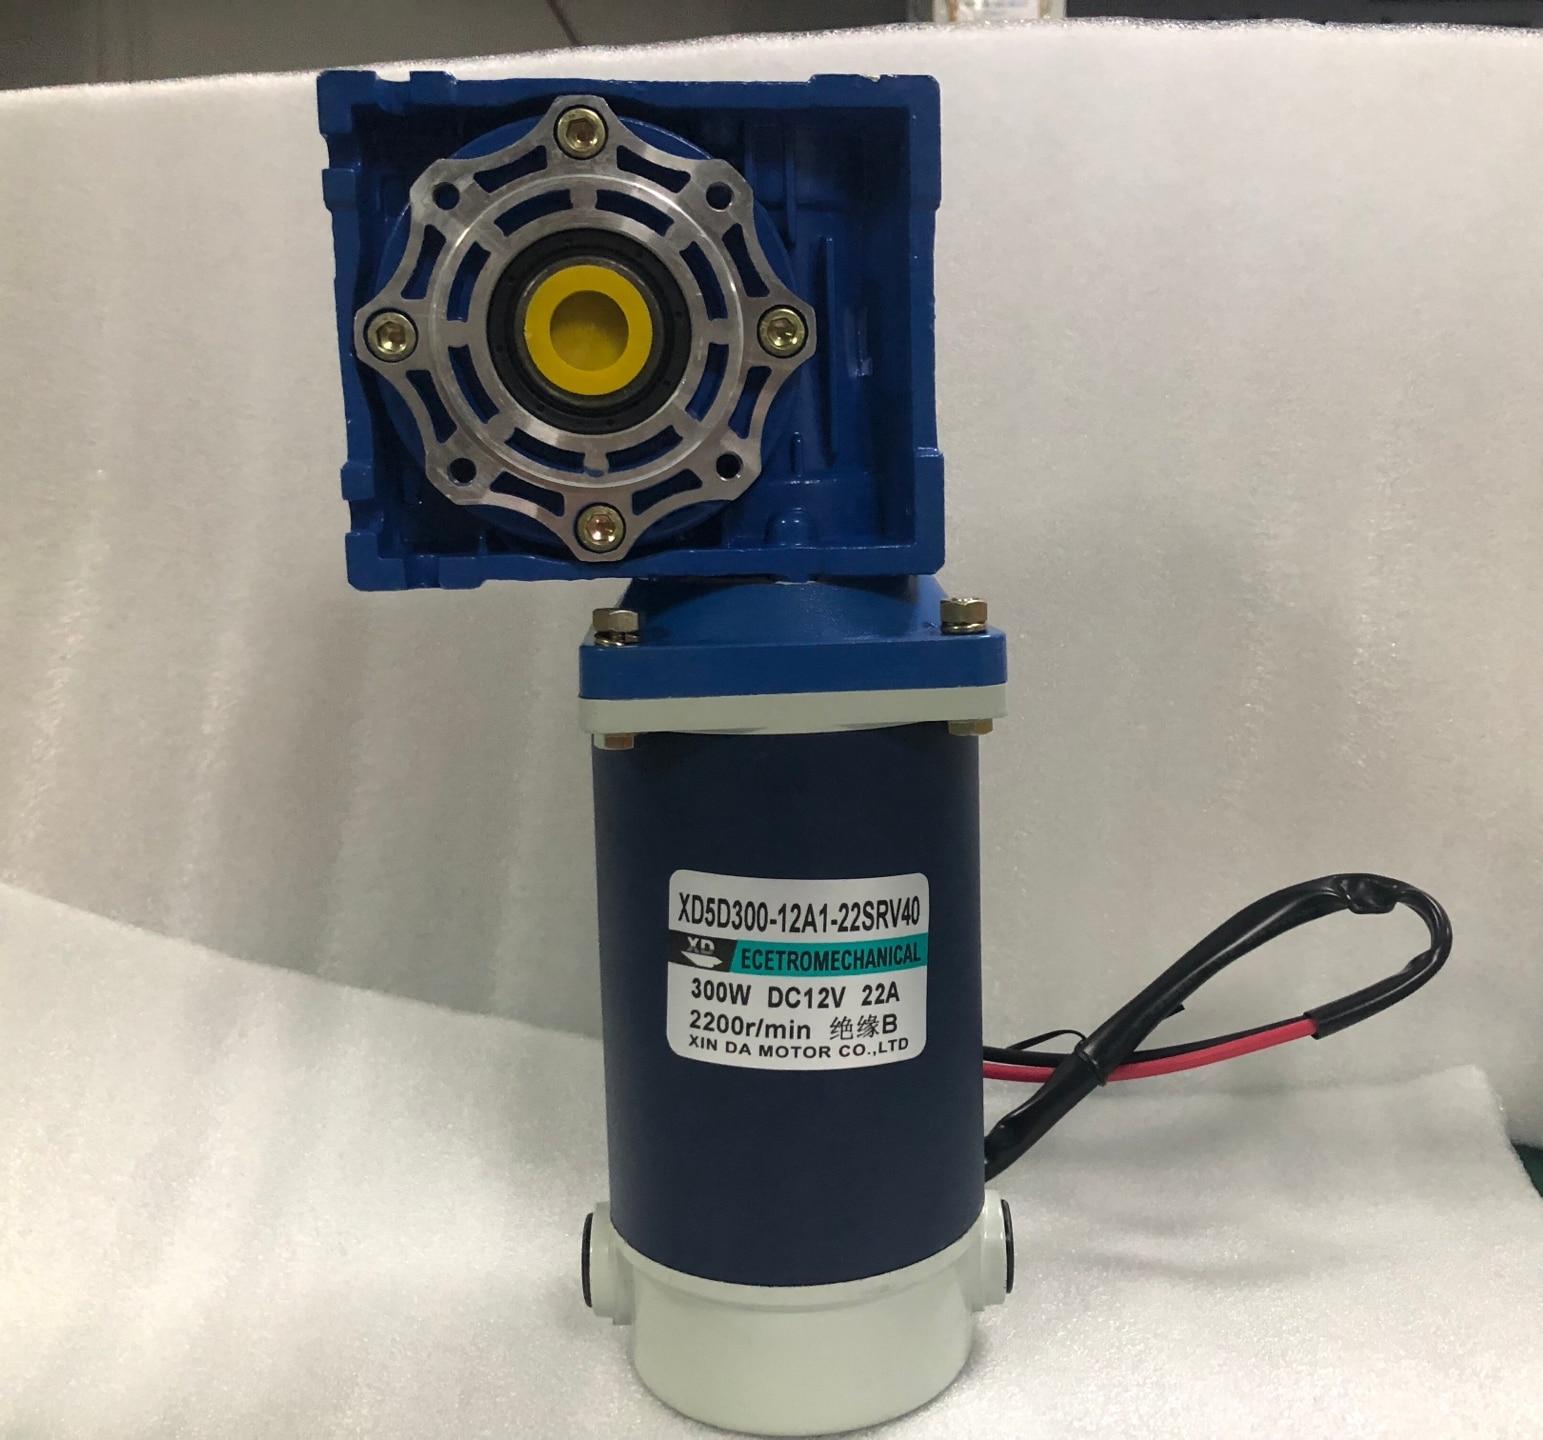 300W 24V DC RV40 Motor reductor a tornillo 12V NMRV40 Motor de engranaje de tornillo sin fin de auto-bloqueo de eje simple CW CCW